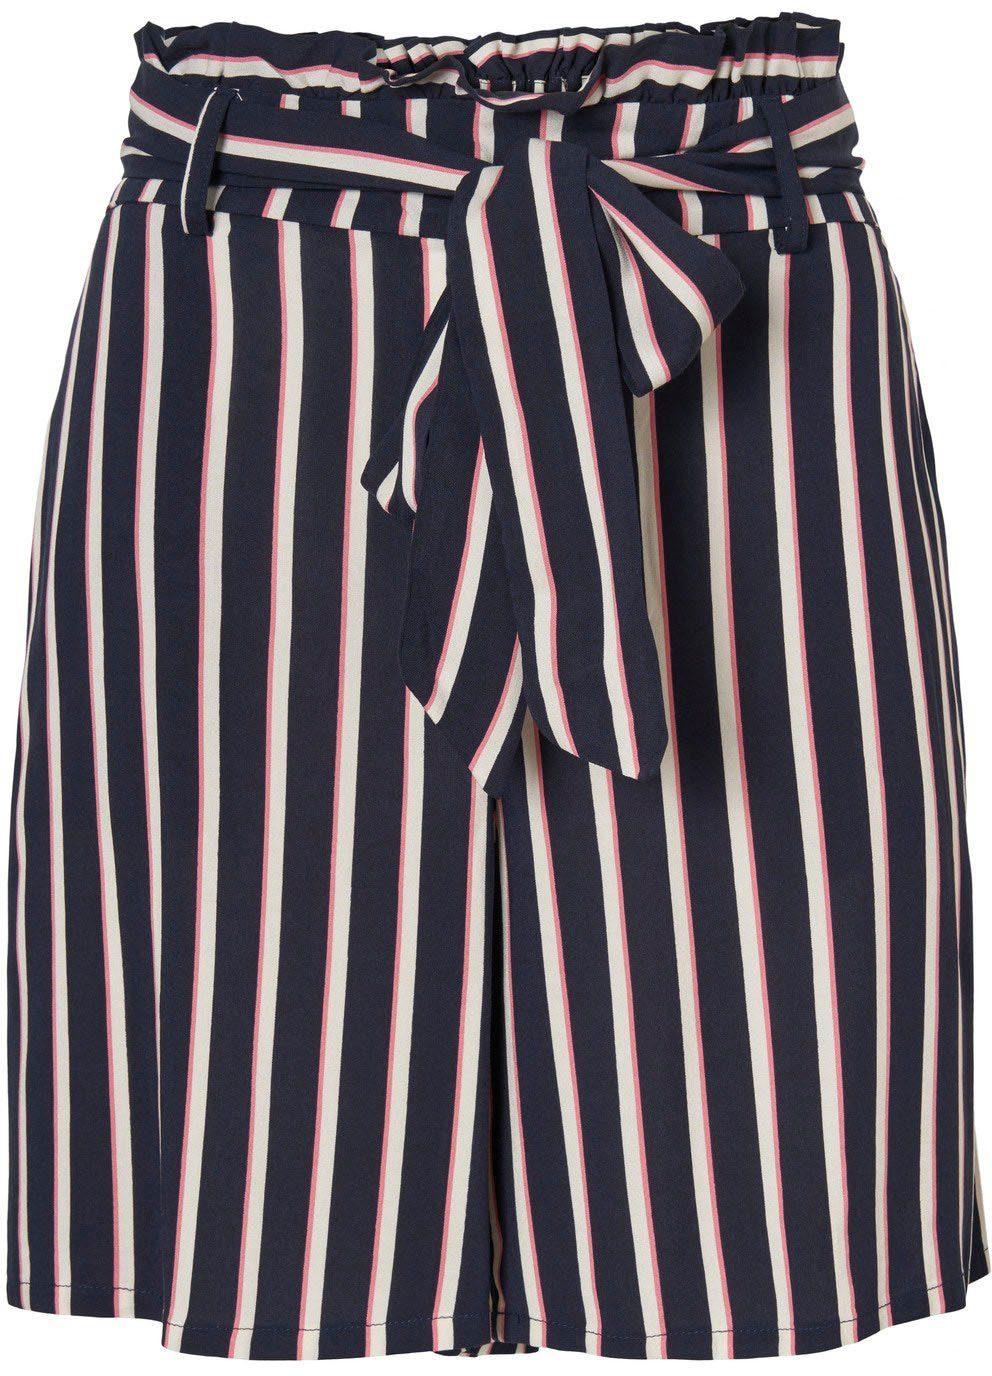 Vero Moda Damen kurze Hose Shorts XS S M L XL Sommer Short Bermuda NEU